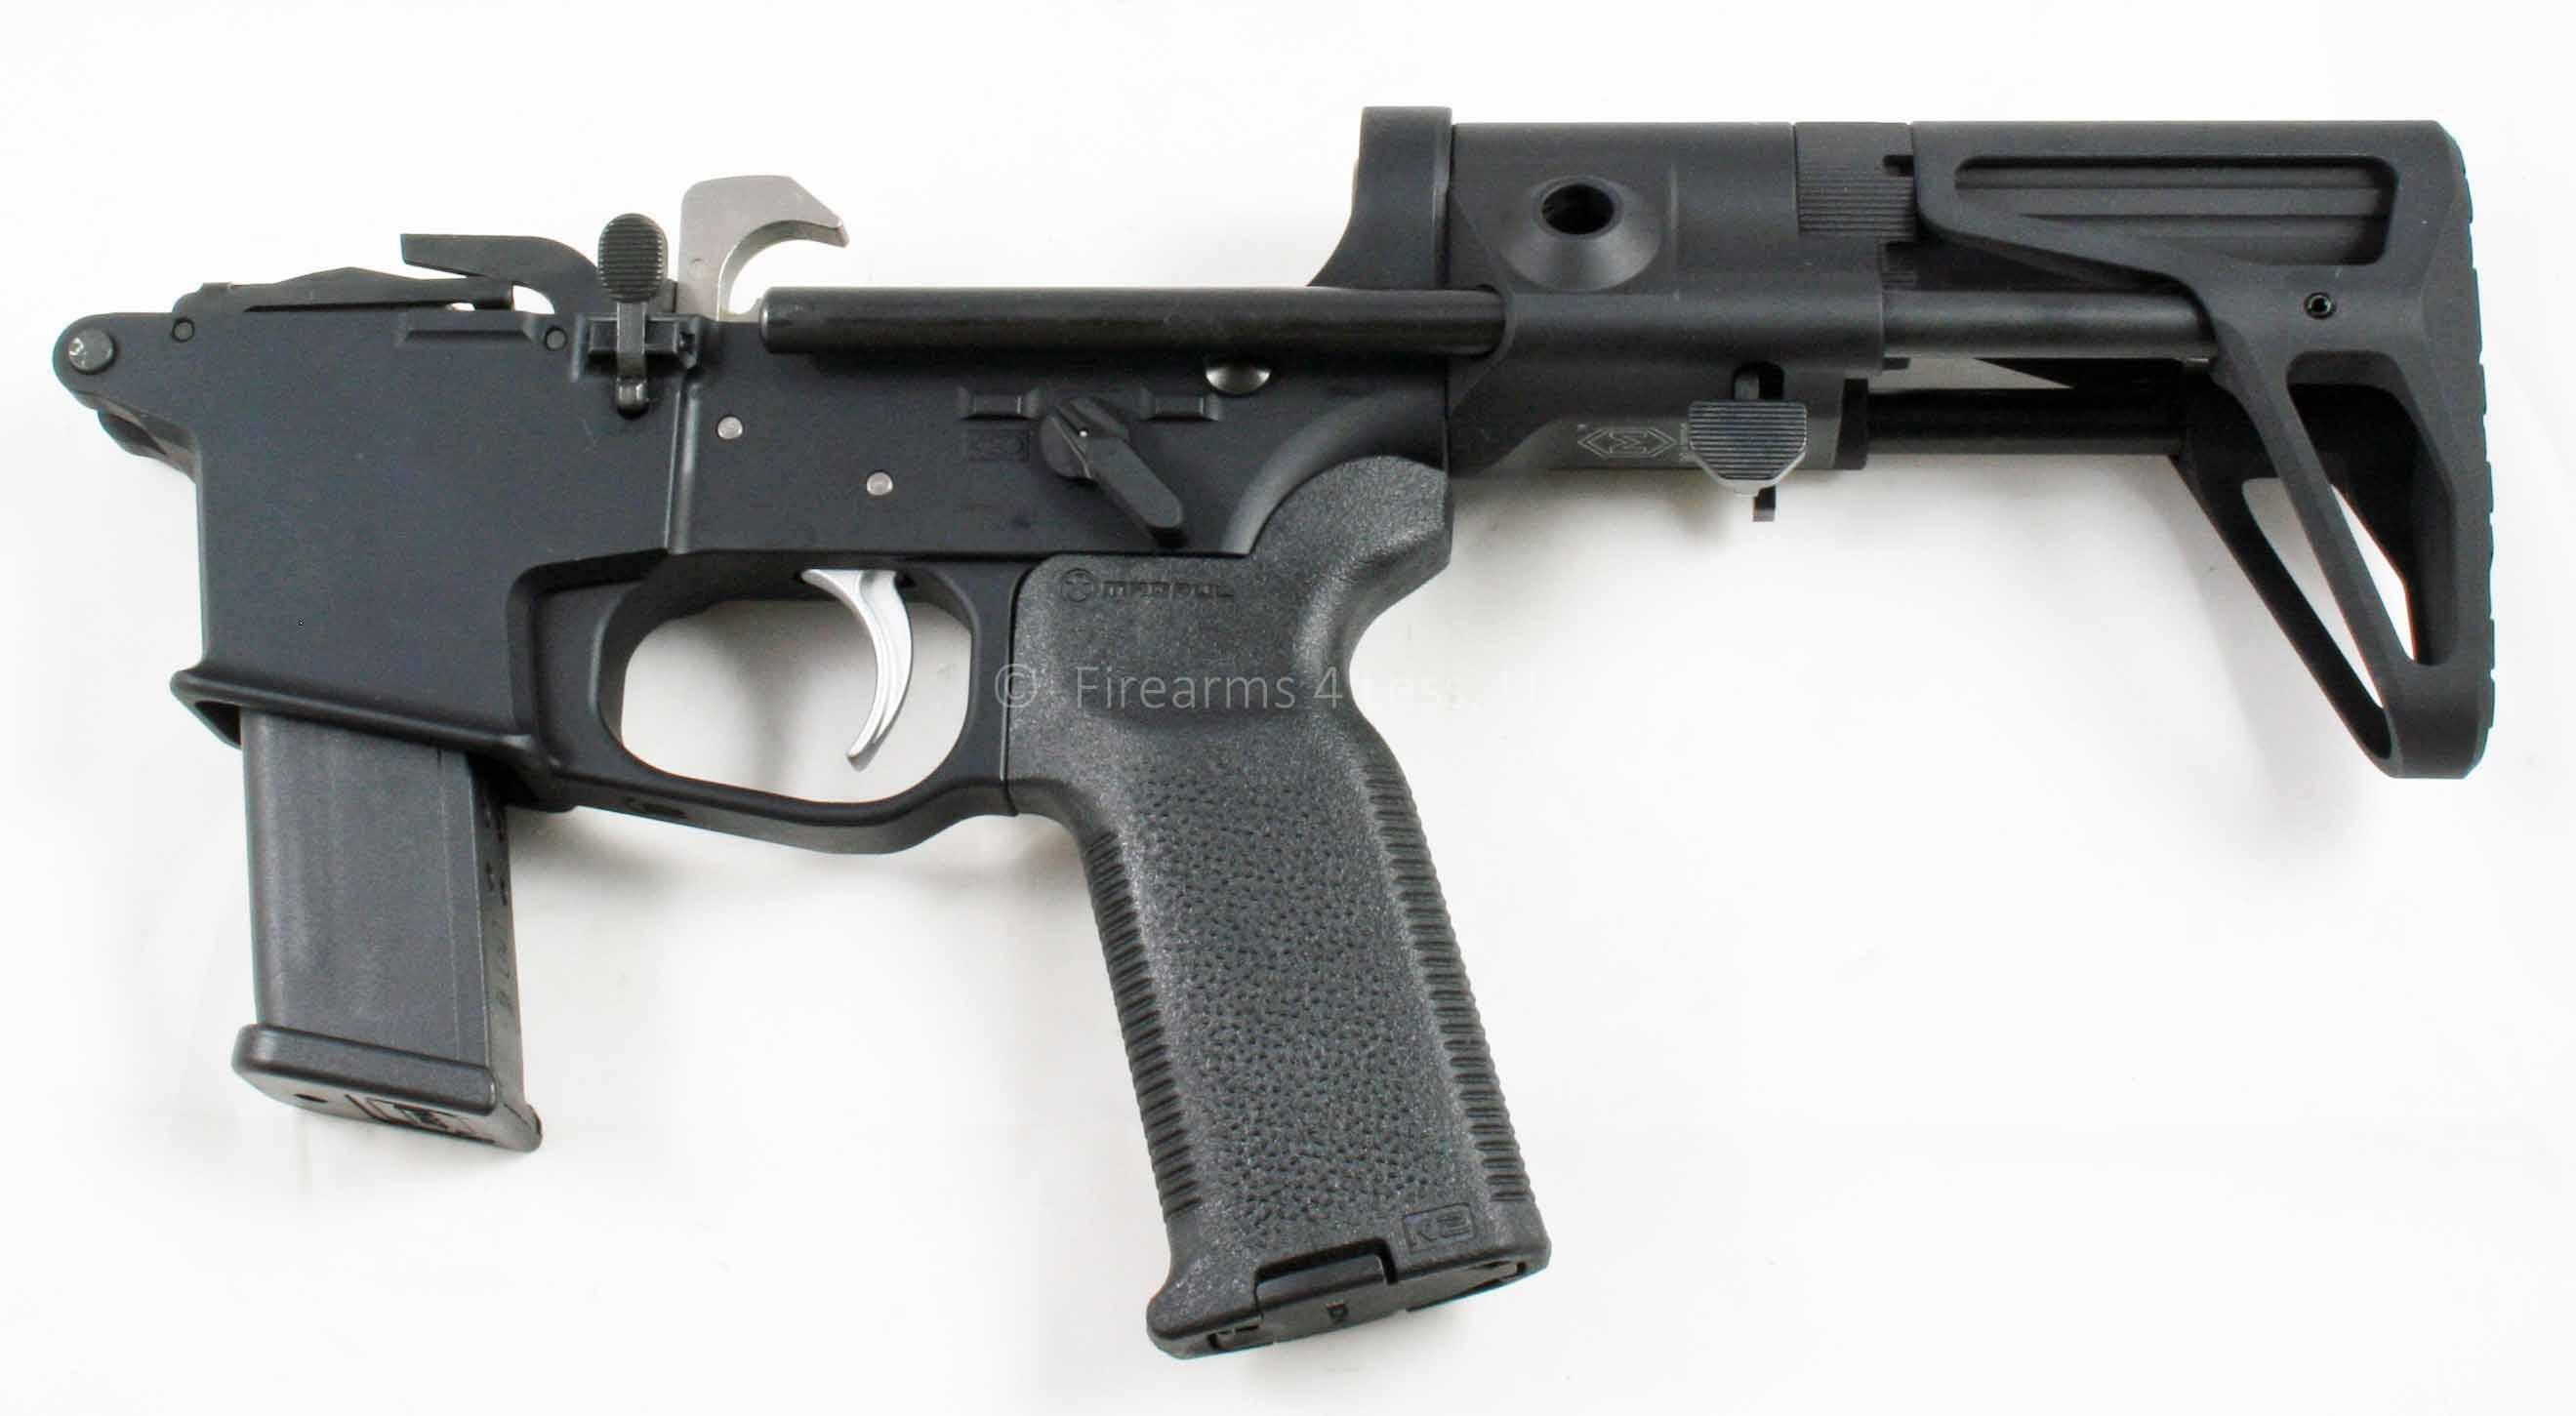 Quarter Circle 10 Gsf 9mm Complete Ar15 Lower W Maxim Cqb Glock Parts Take Down Pinterest Pattern